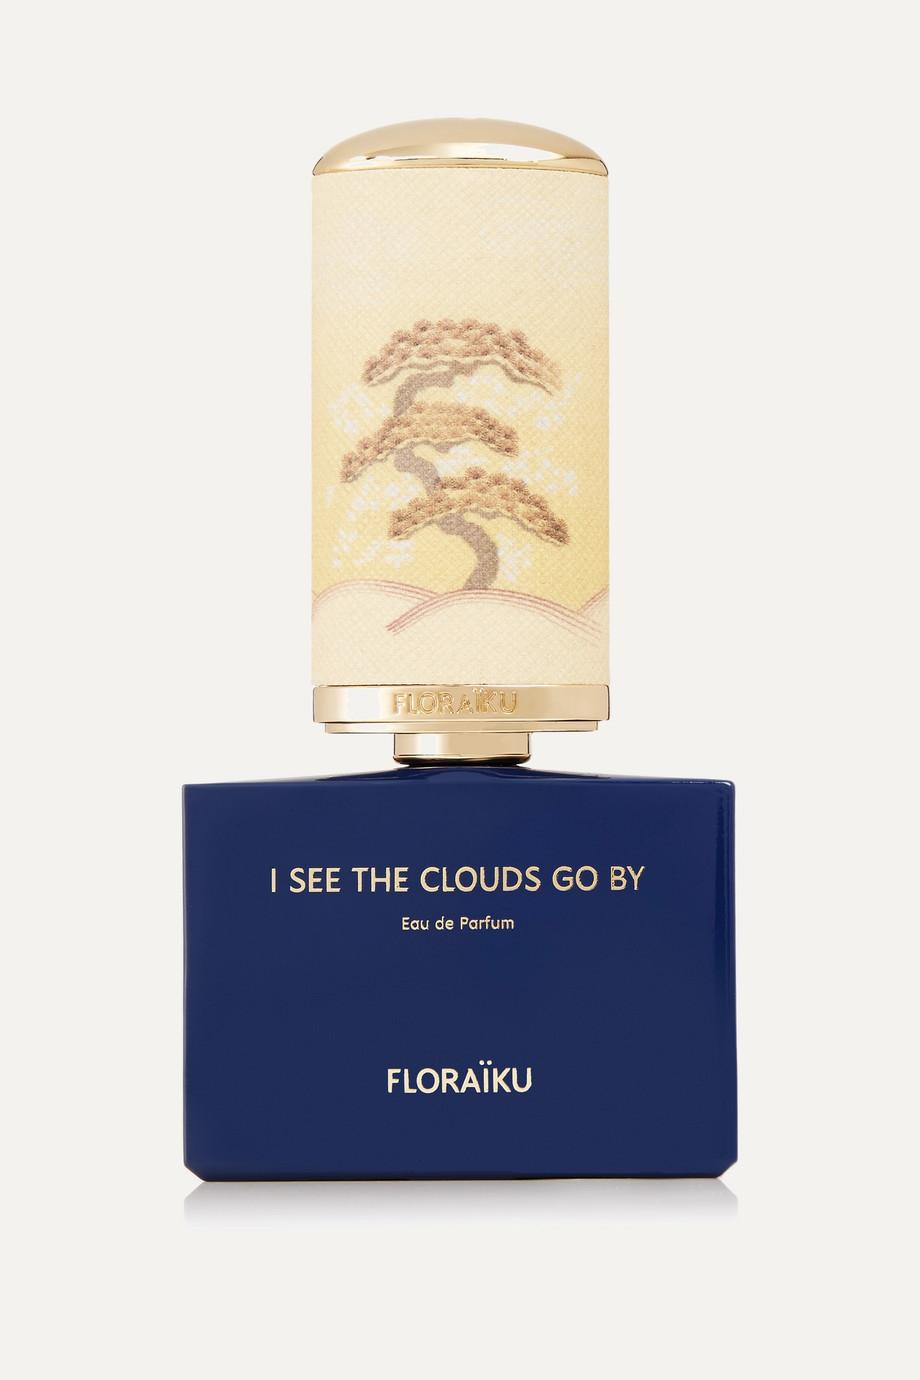 Floraiku I See The Clouds Go By Eau de Parfum, 50ml & 10ml